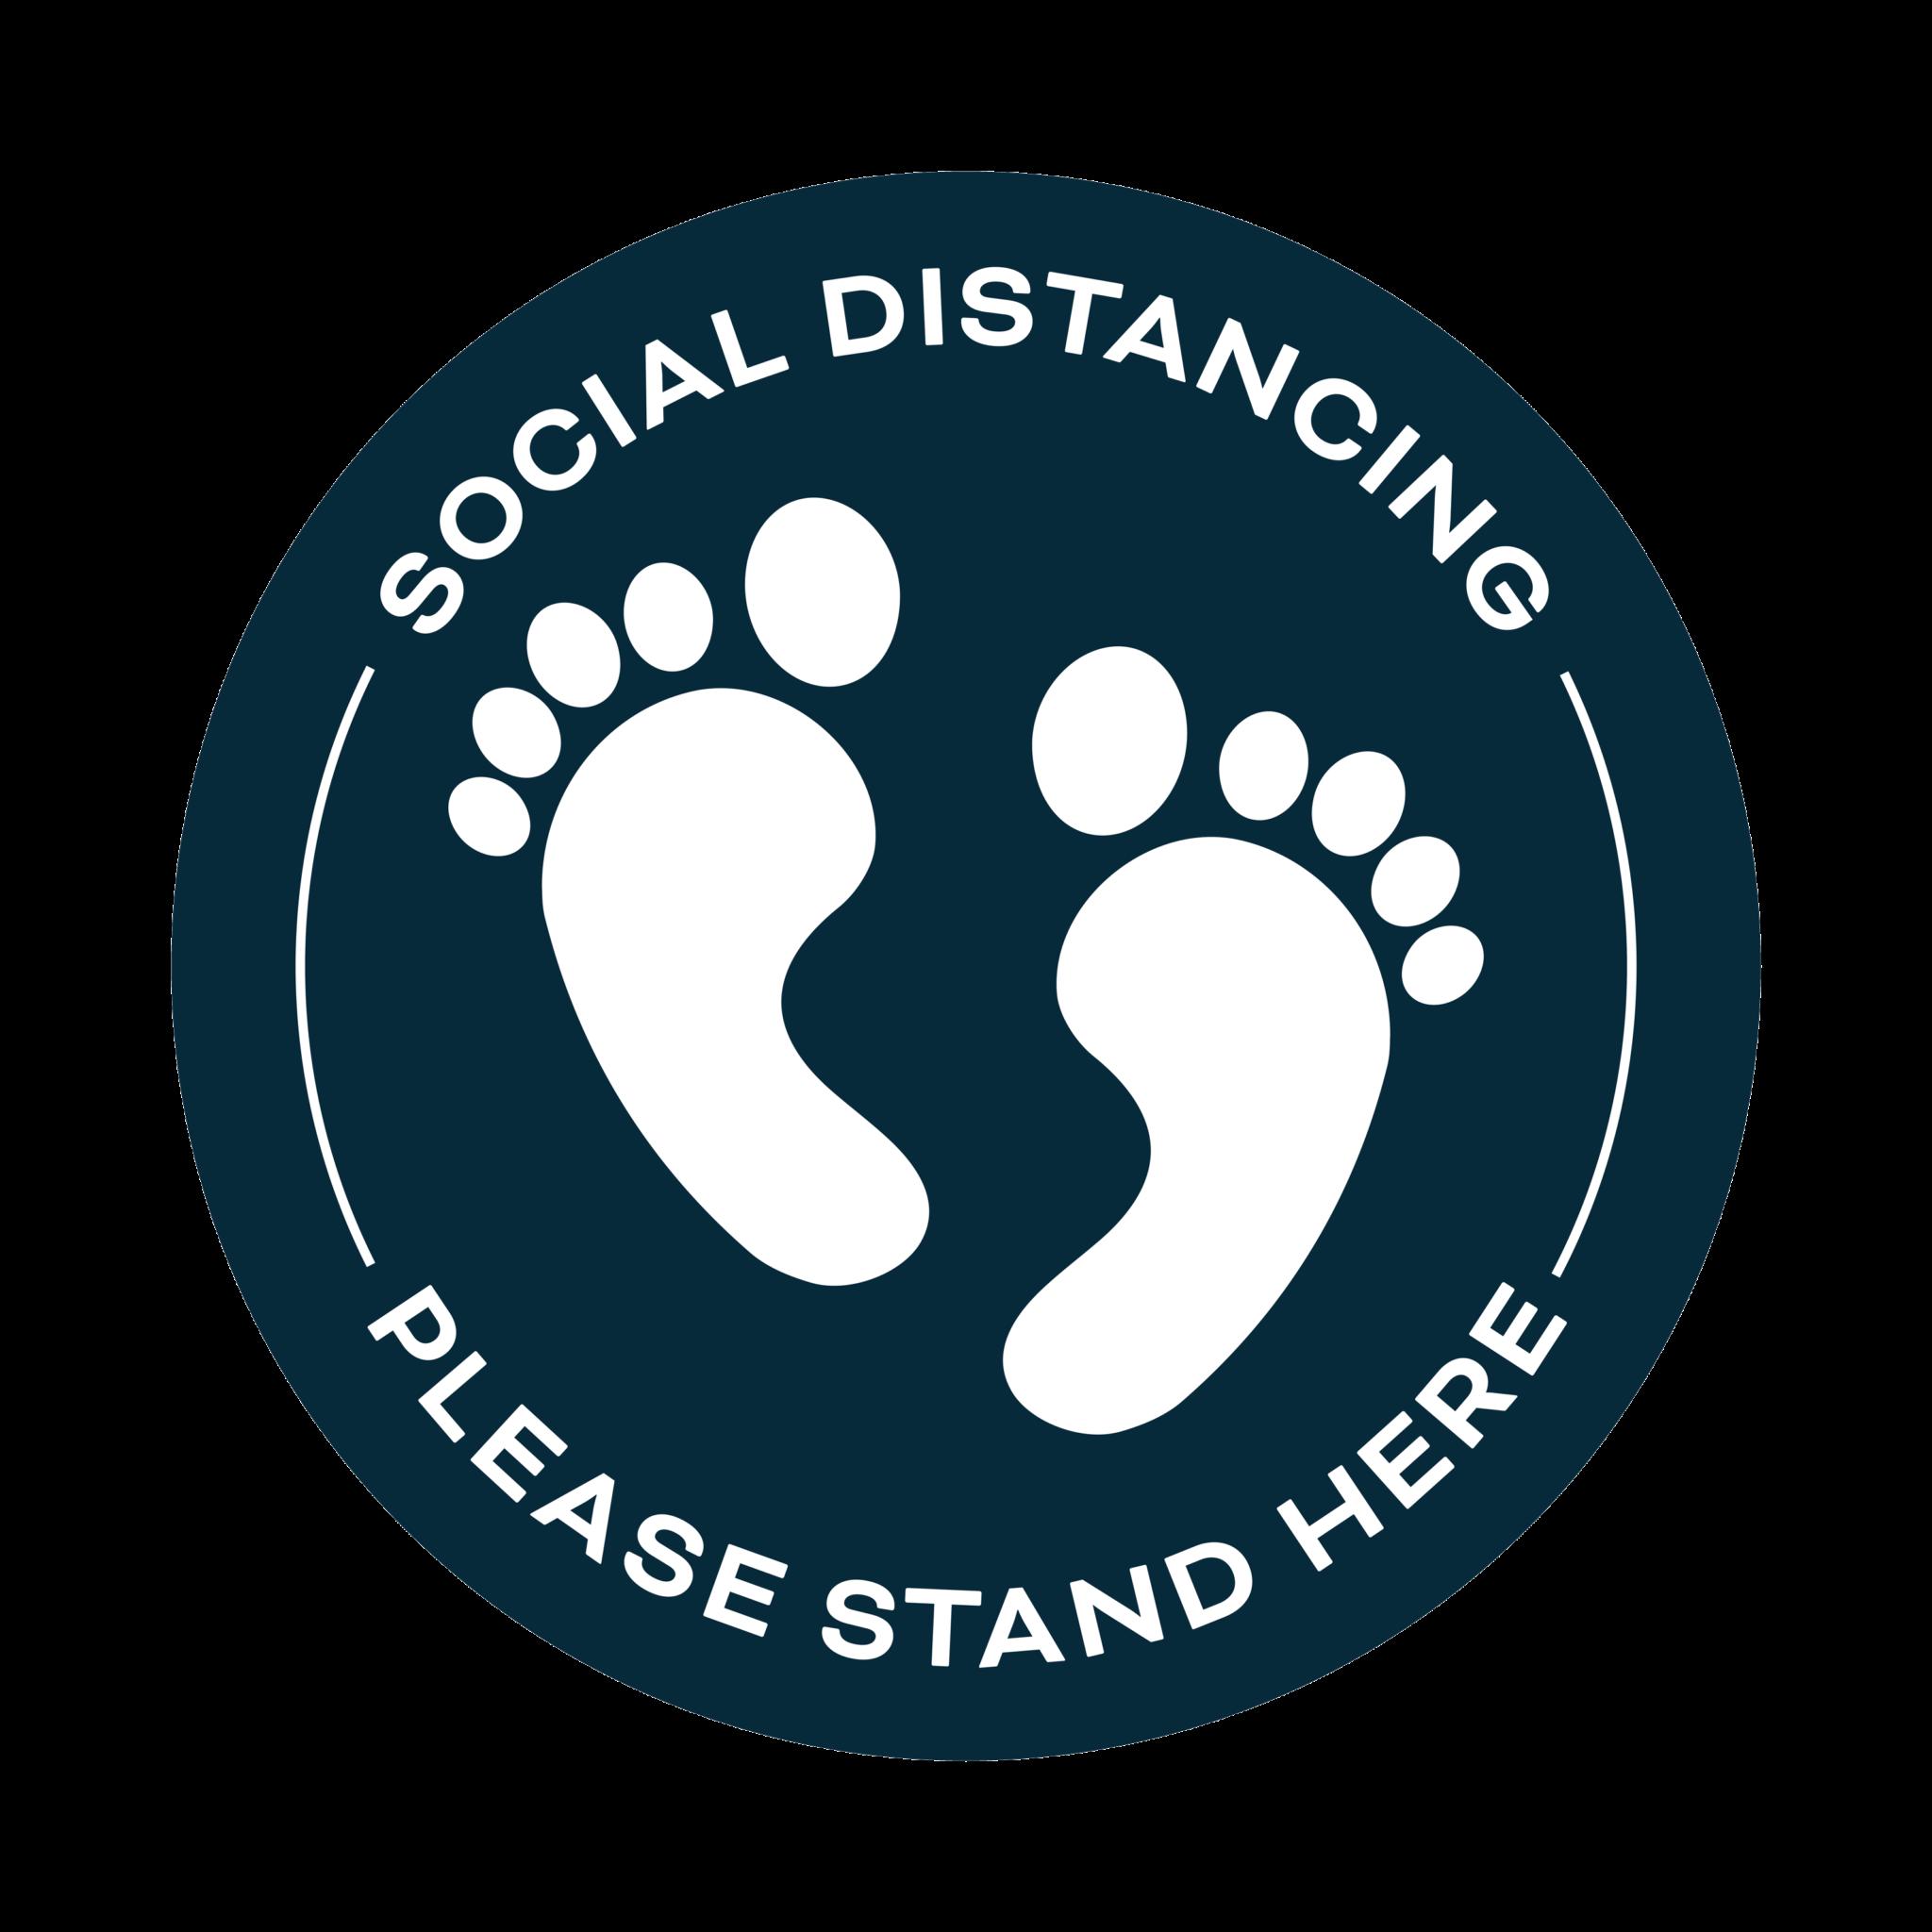 Covid 19 Social Distancing Floor Sticker Blue